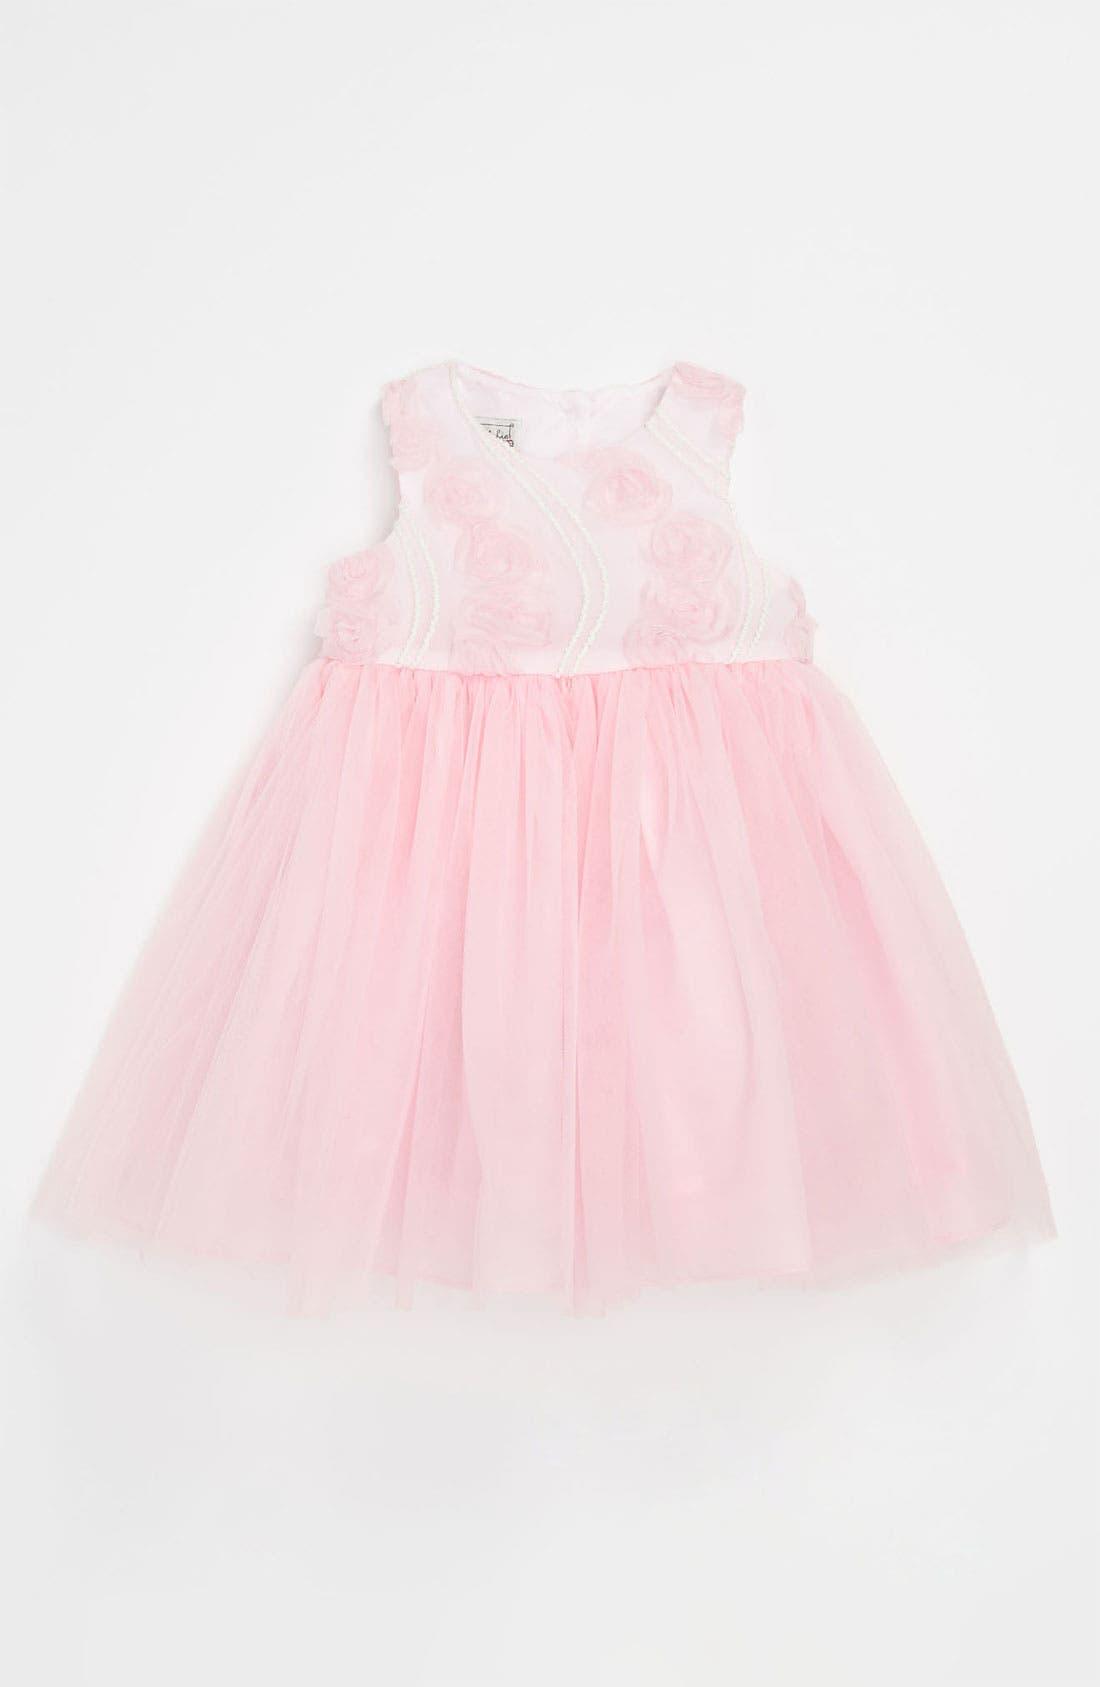 Alternate Image 1 Selected - Pippa & Julie Soutache Ballerina Dress (Toddler)